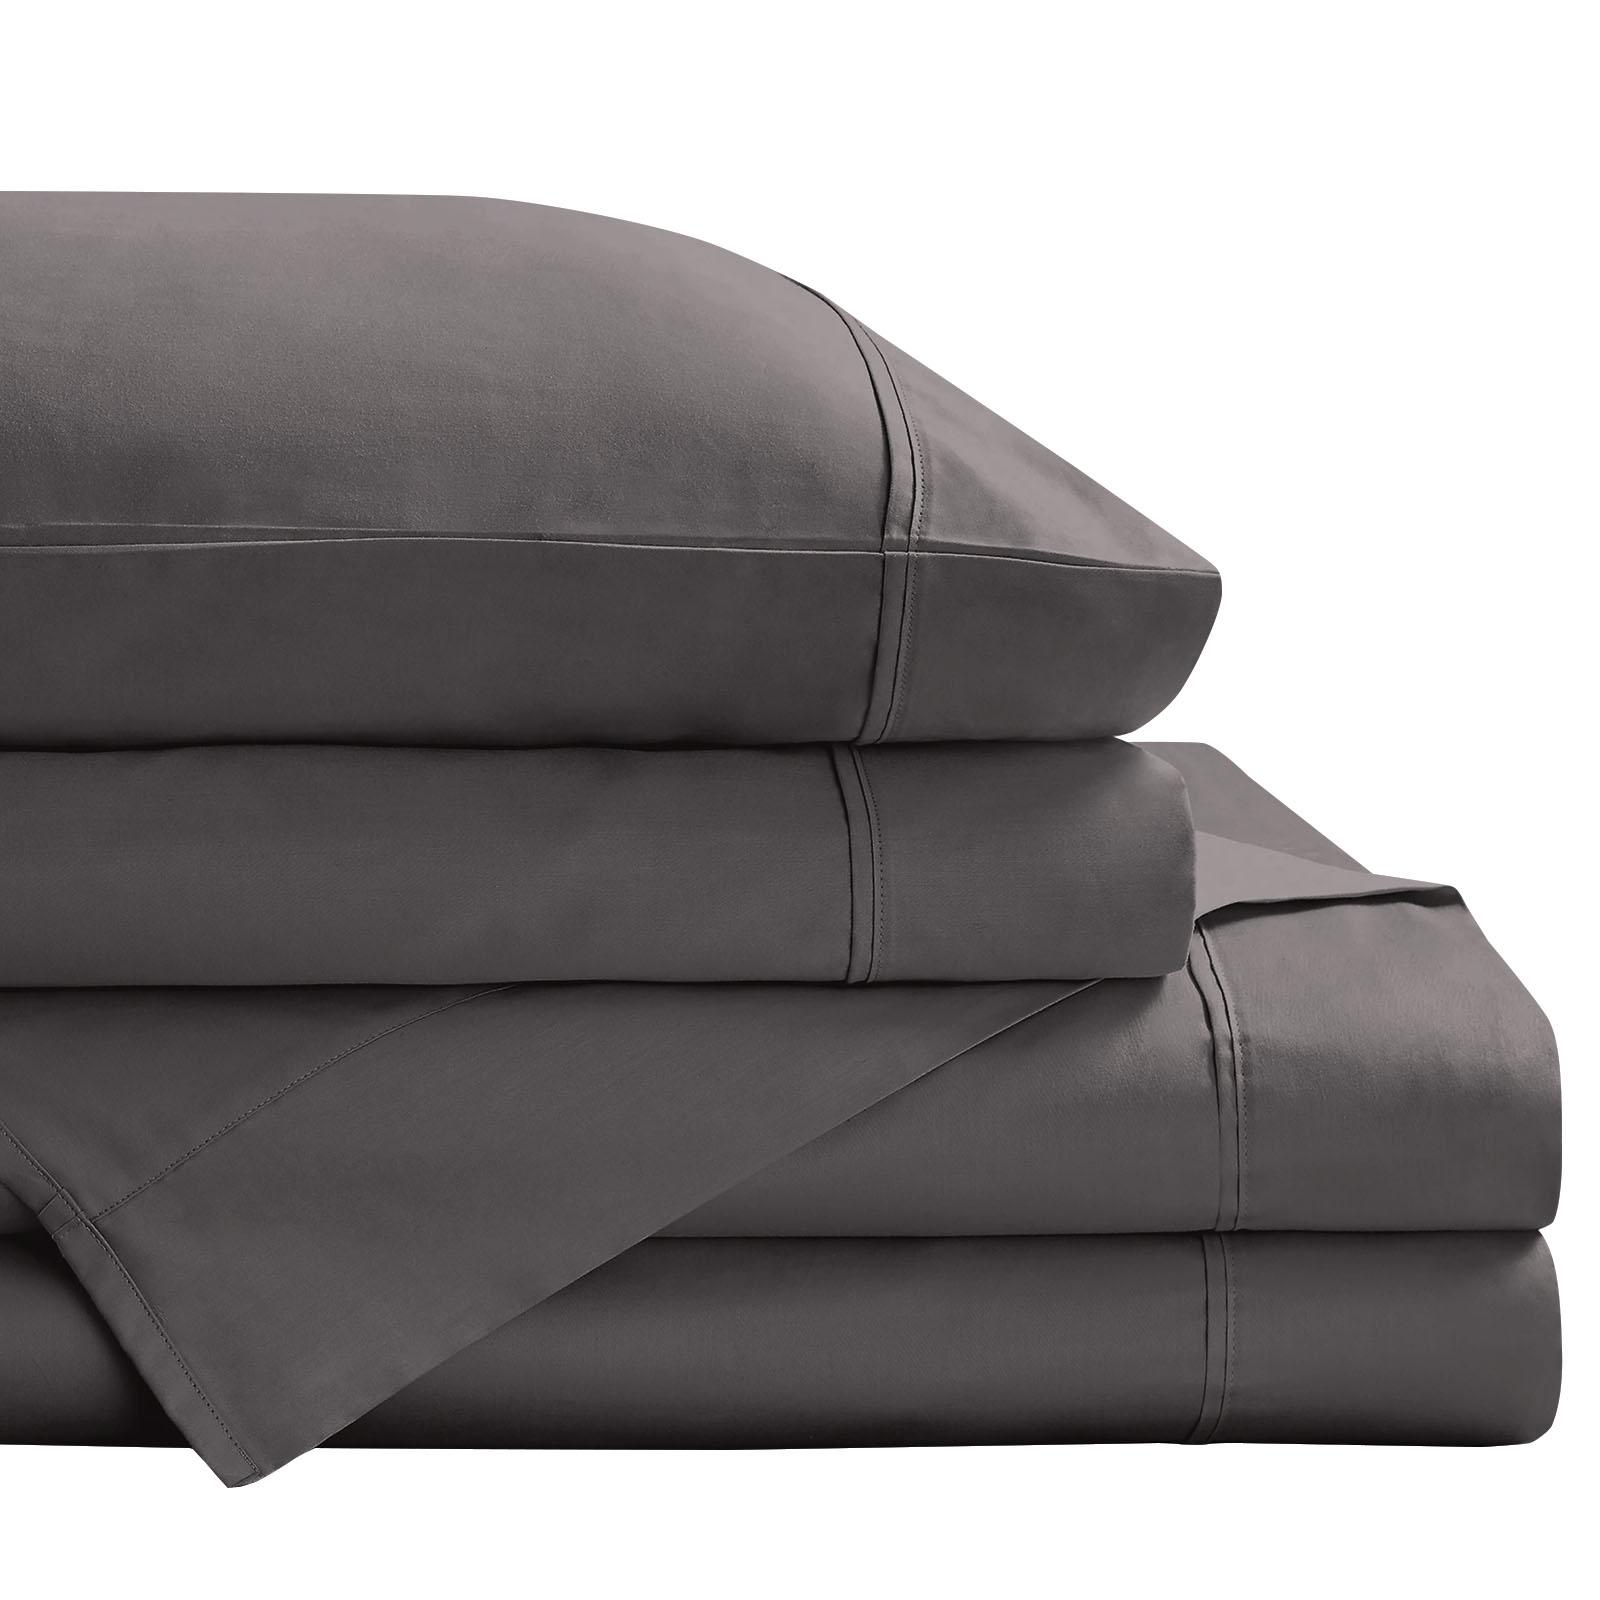 thumbnail 66 - Royal Comfort 1000TC Hotel Grade Bamboo Cotton Sheets Pillowcases Set Ultrasoft